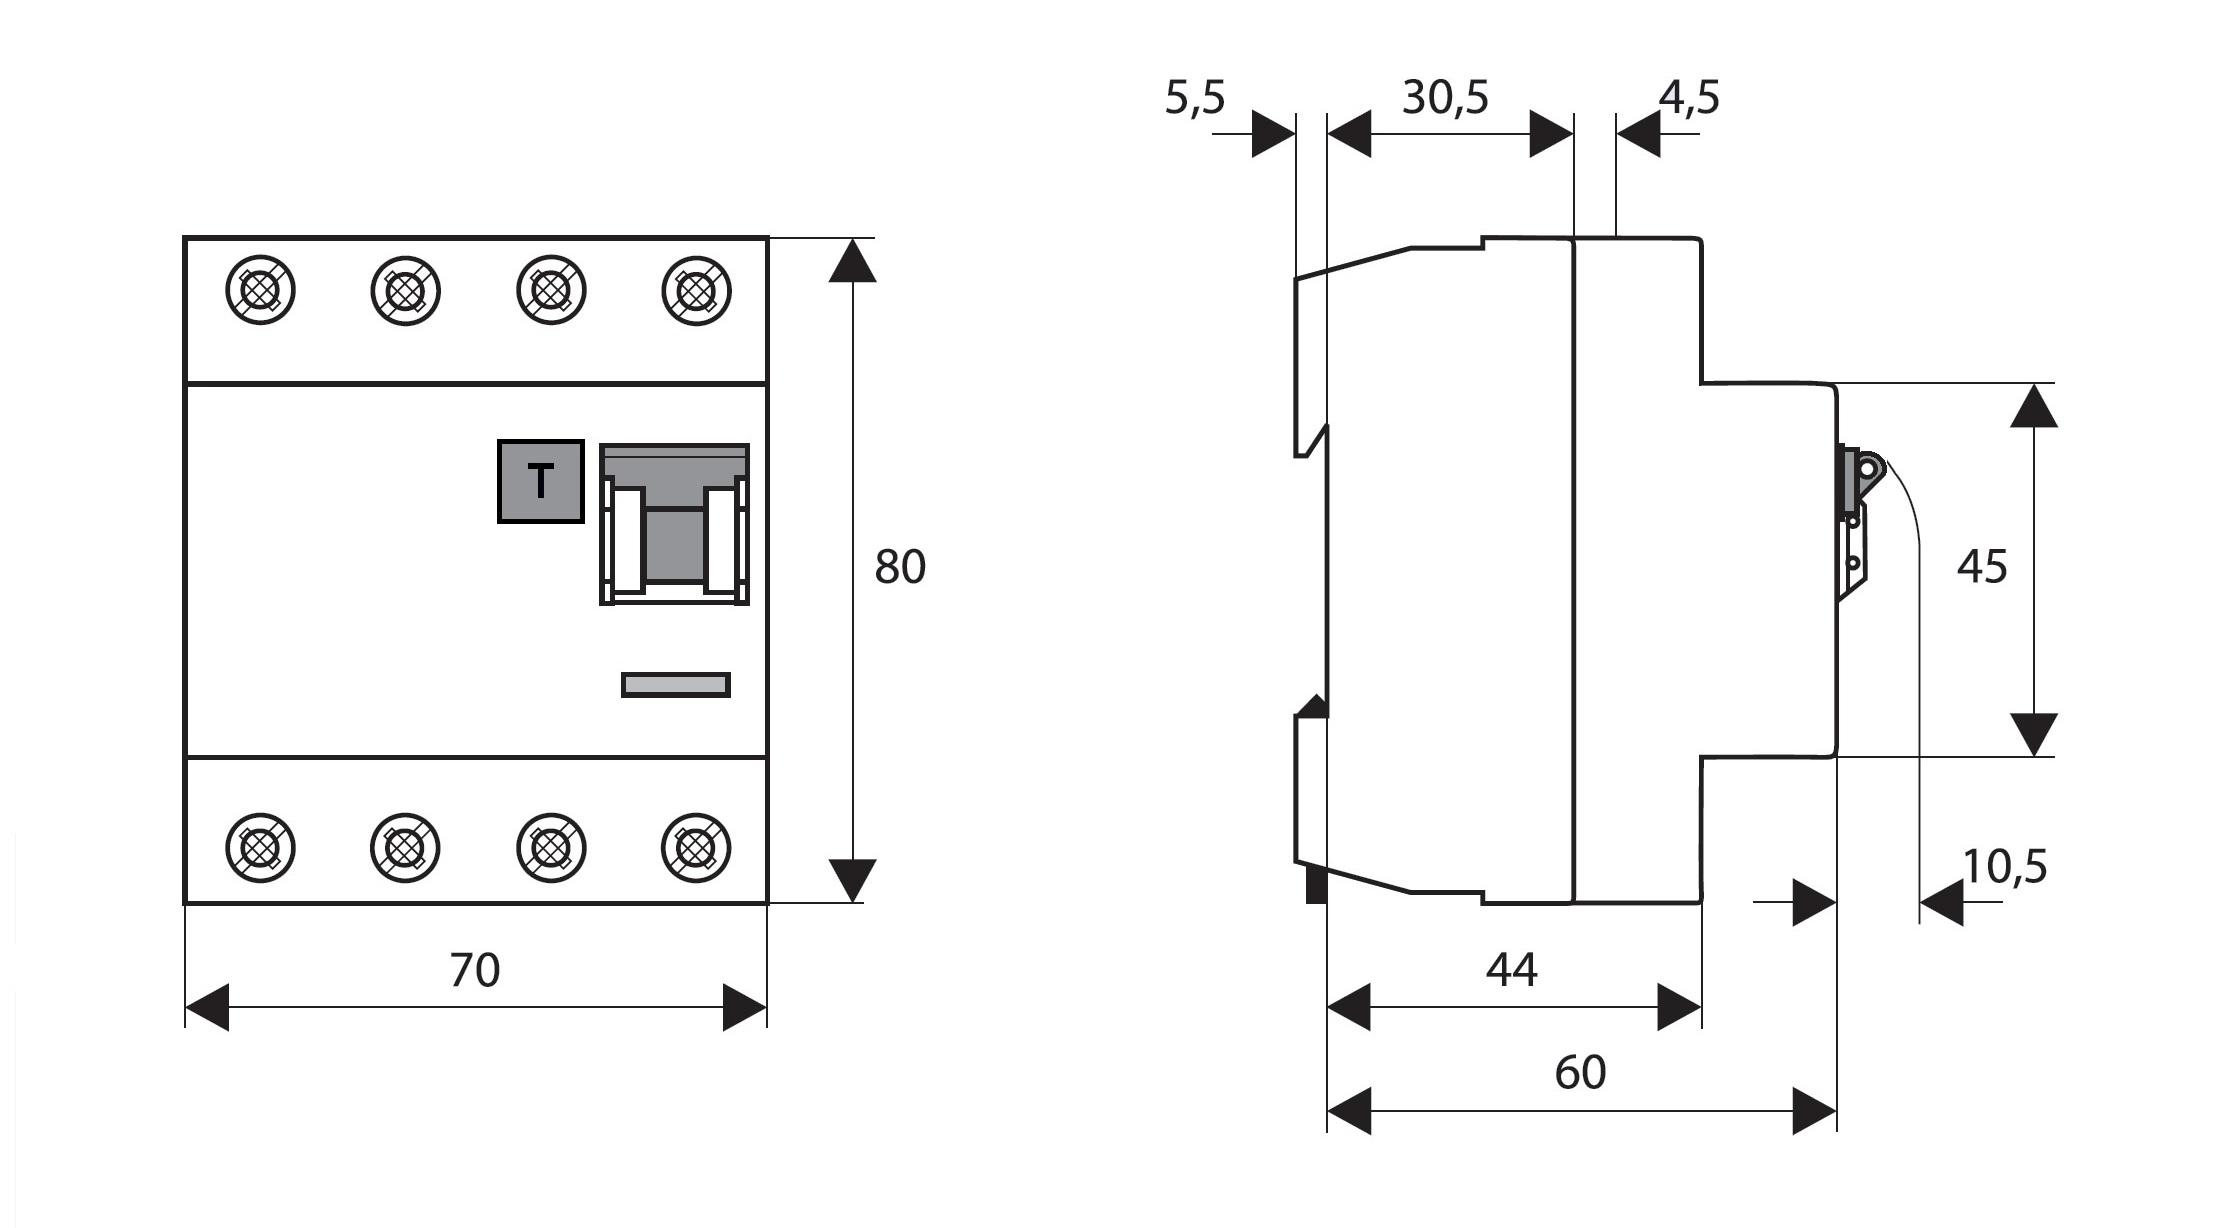 elektro austria fi schalter 63a 4 polig 30ma vsf bauart g typ a. Black Bedroom Furniture Sets. Home Design Ideas